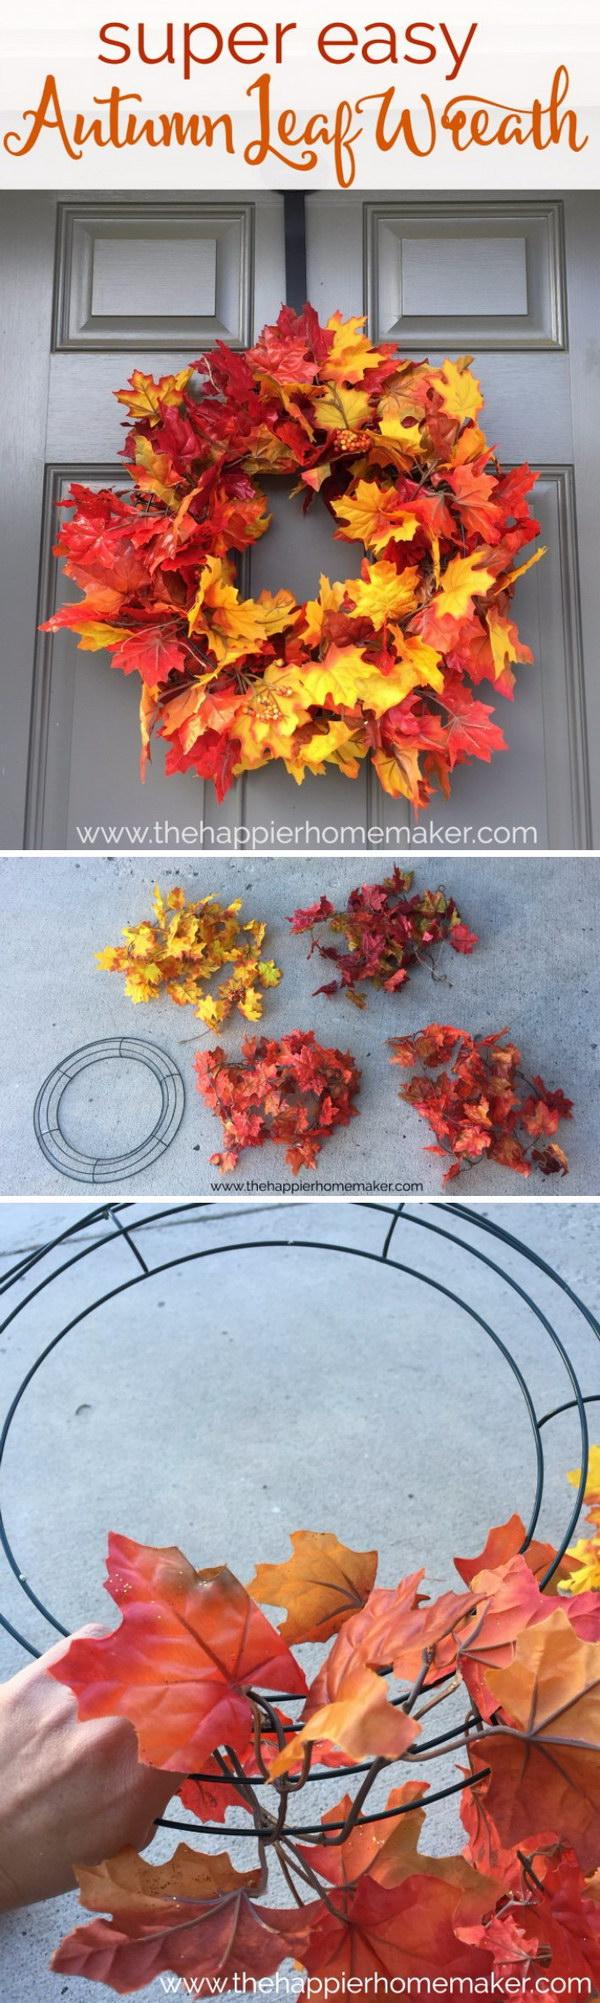 Super Easy Autumn Leaf Wreath.